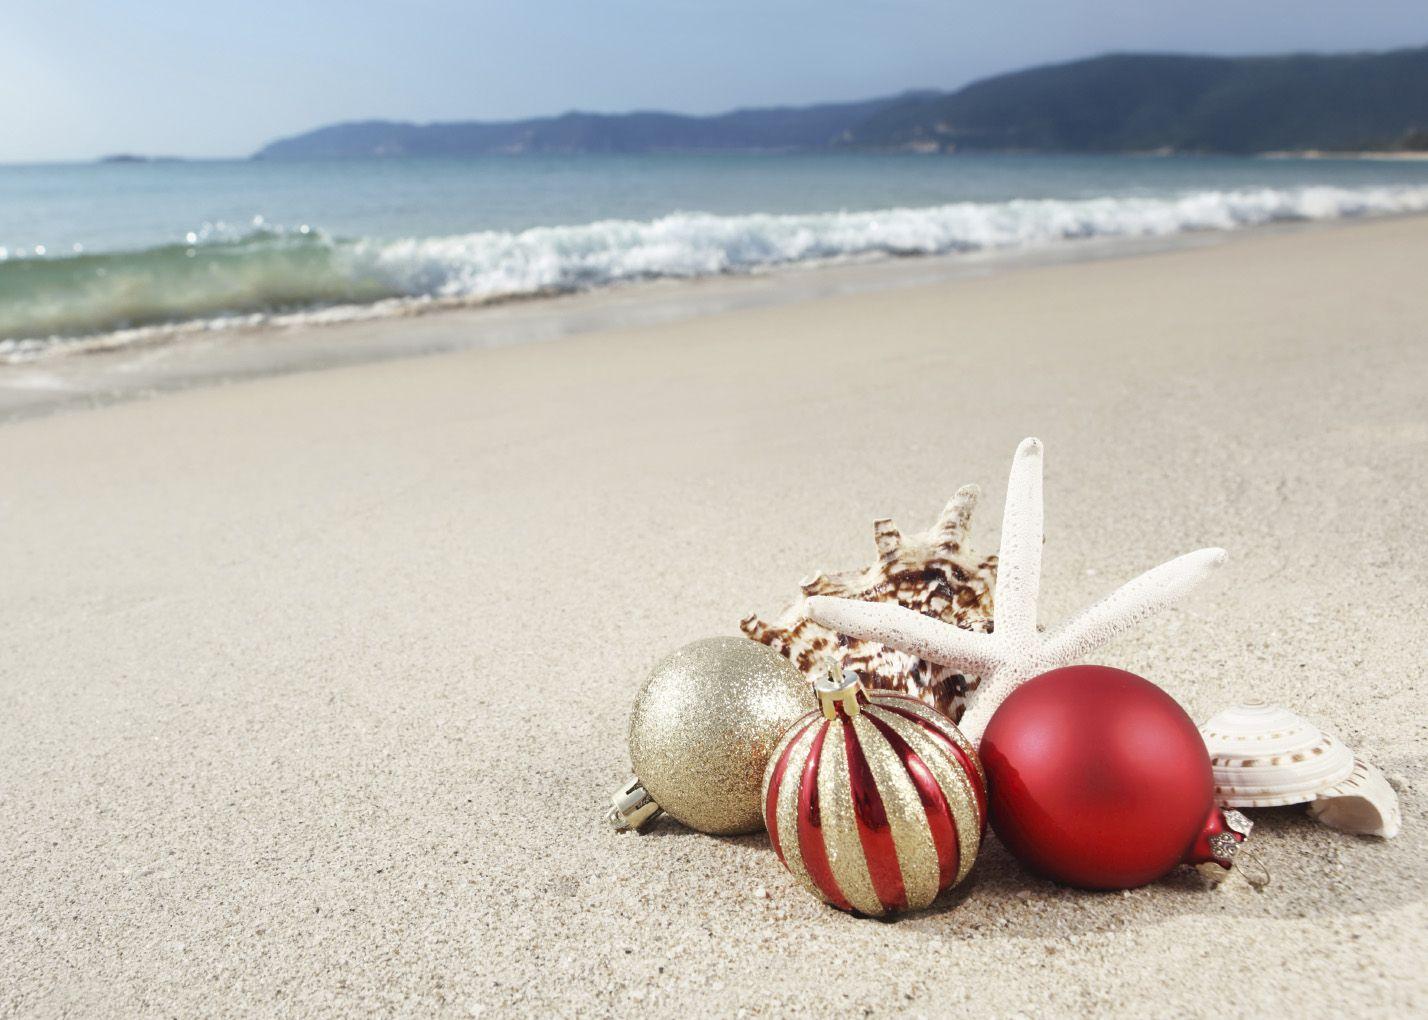 Christmas beach ornaments - Beach Christmas Google Search